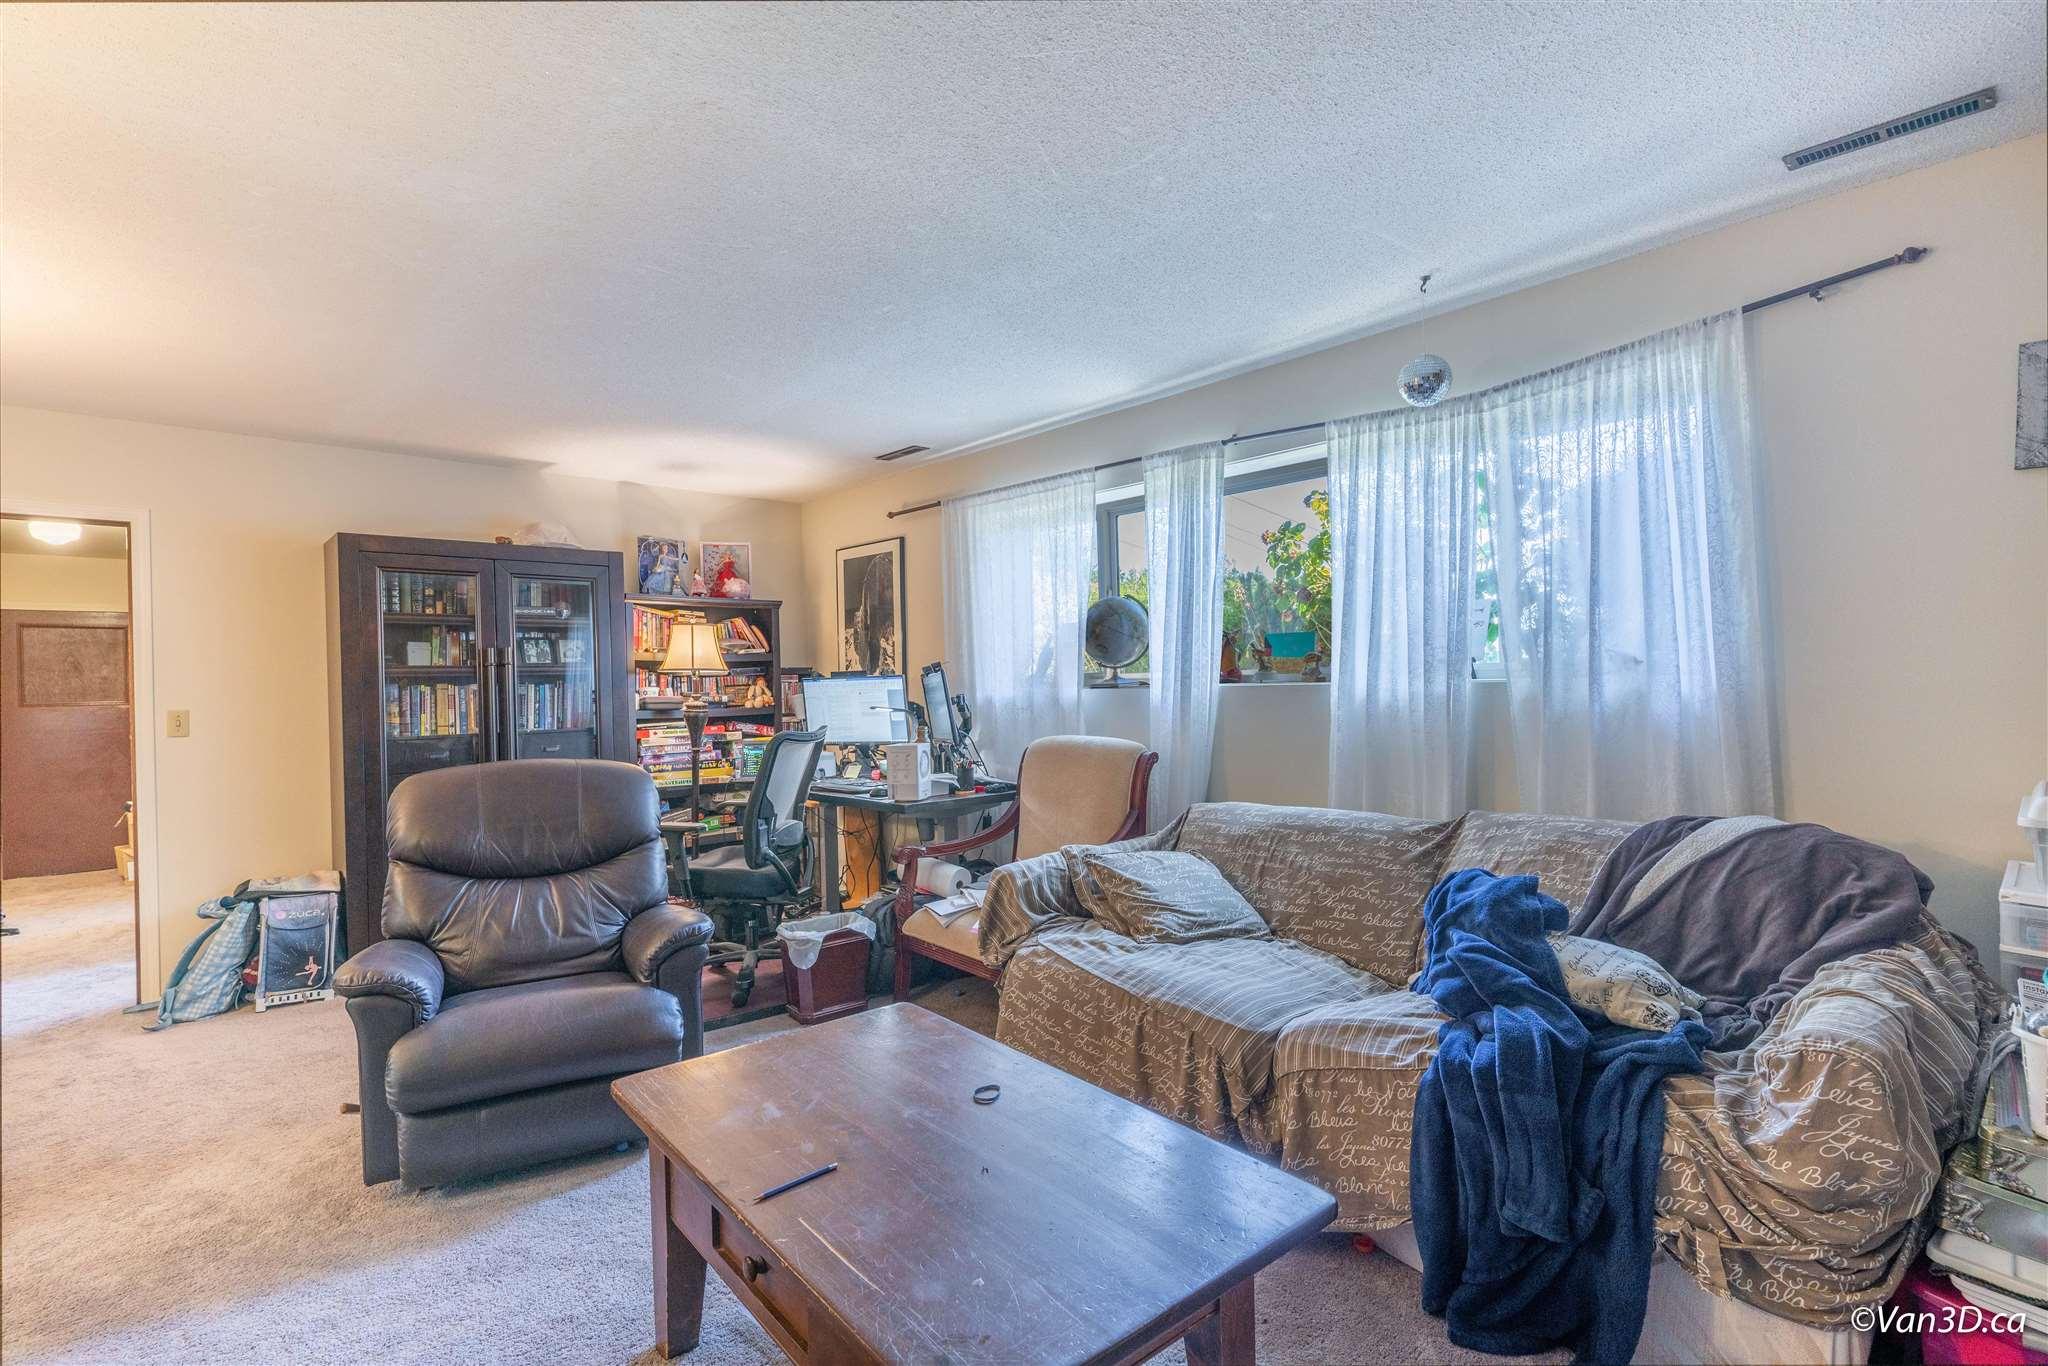 14495 MANN PARK CRESCENT - White Rock House/Single Family for sale, 4 Bedrooms (R2604561) - #35